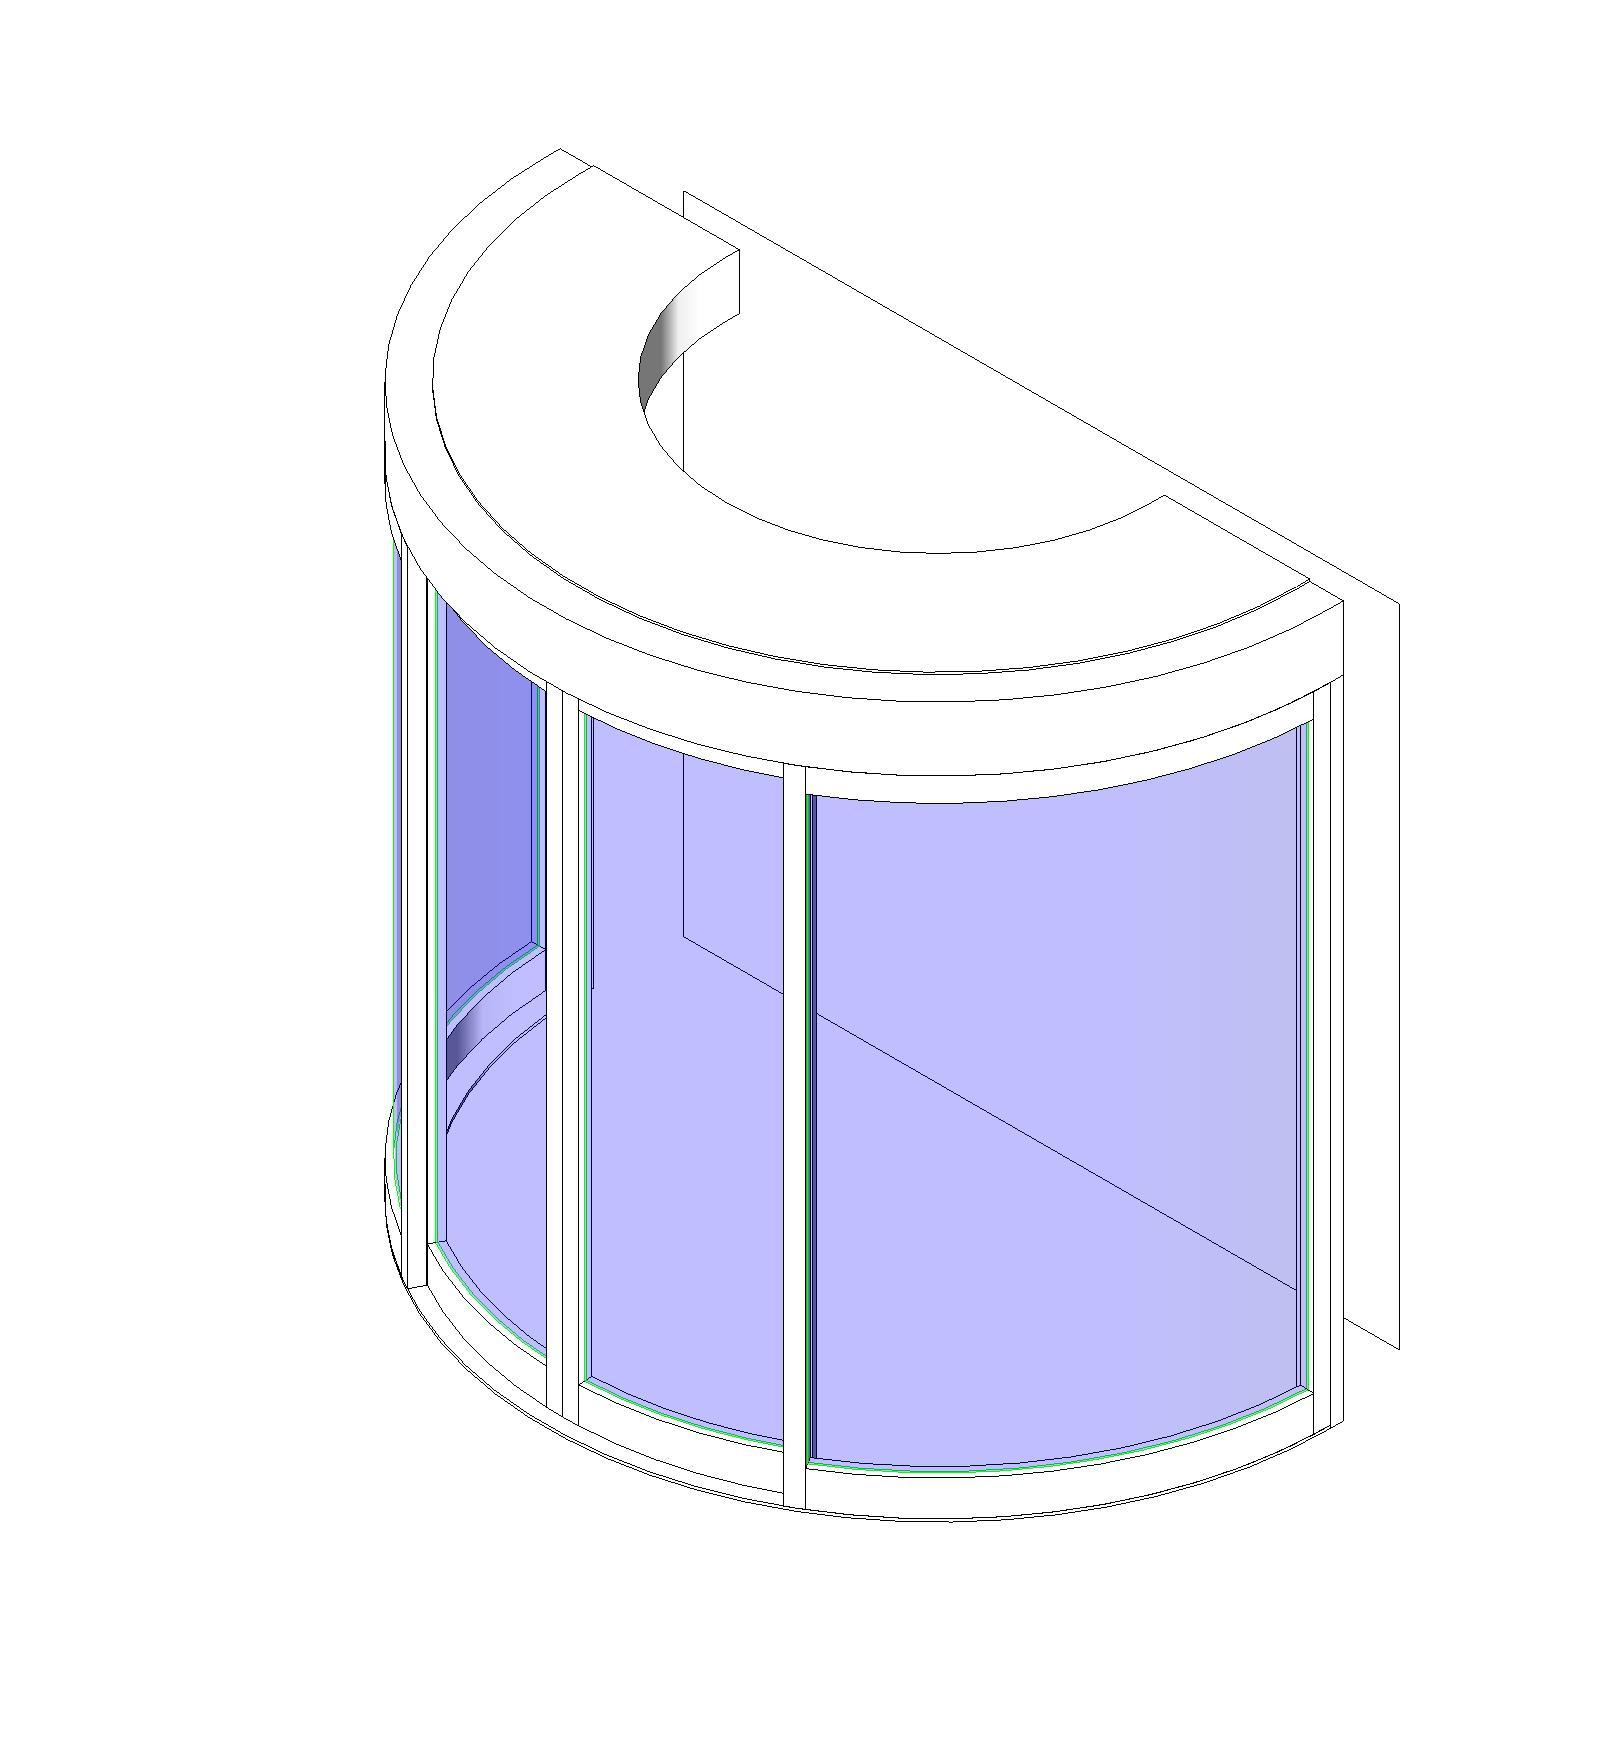 Round Sliding Door Design: BIM Objects / Families